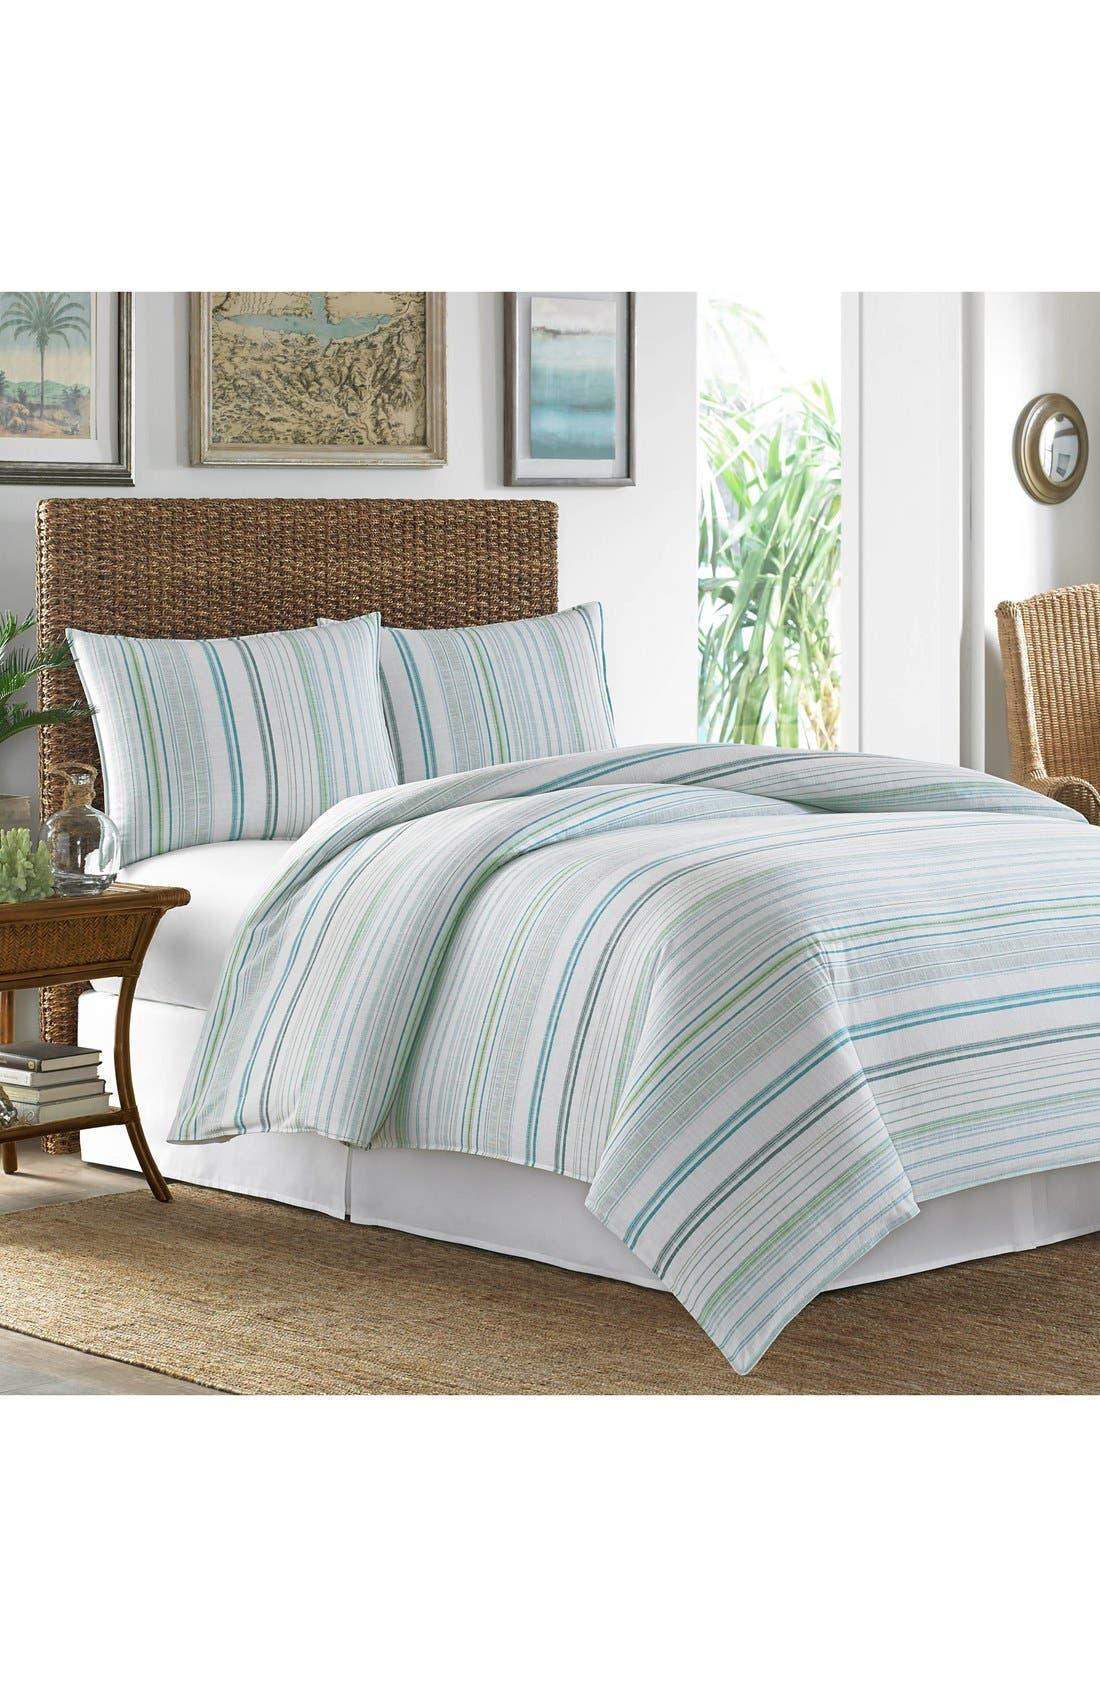 La Scala Breezer Comforter, Sham & Bed Skirt Set,                         Main,                         color, Seaglass